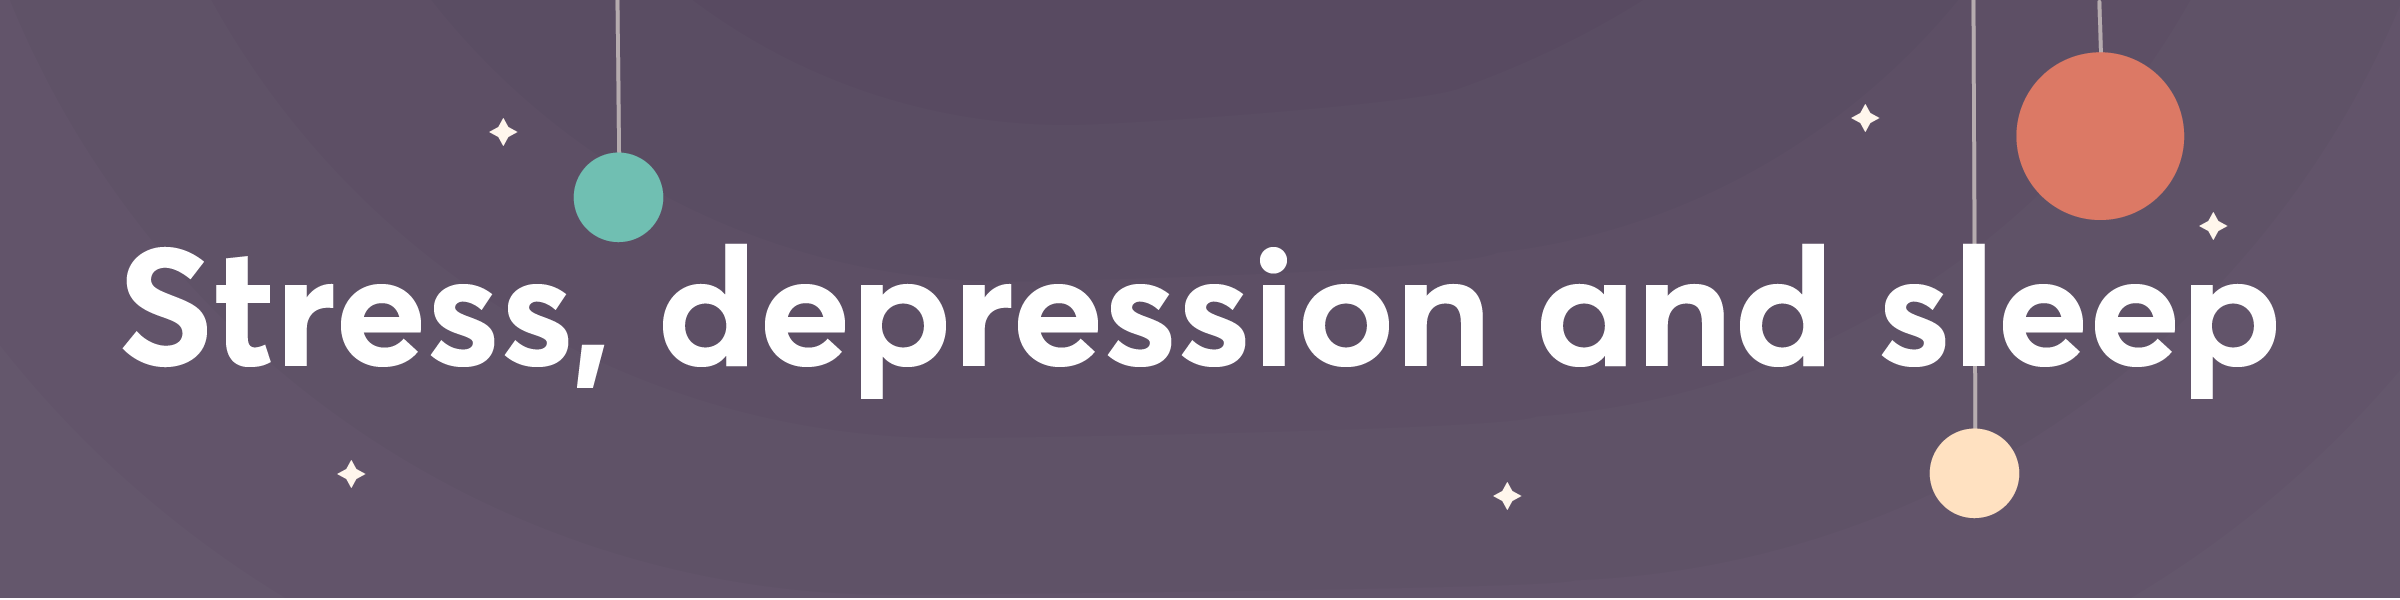 Stress, depression and sleep